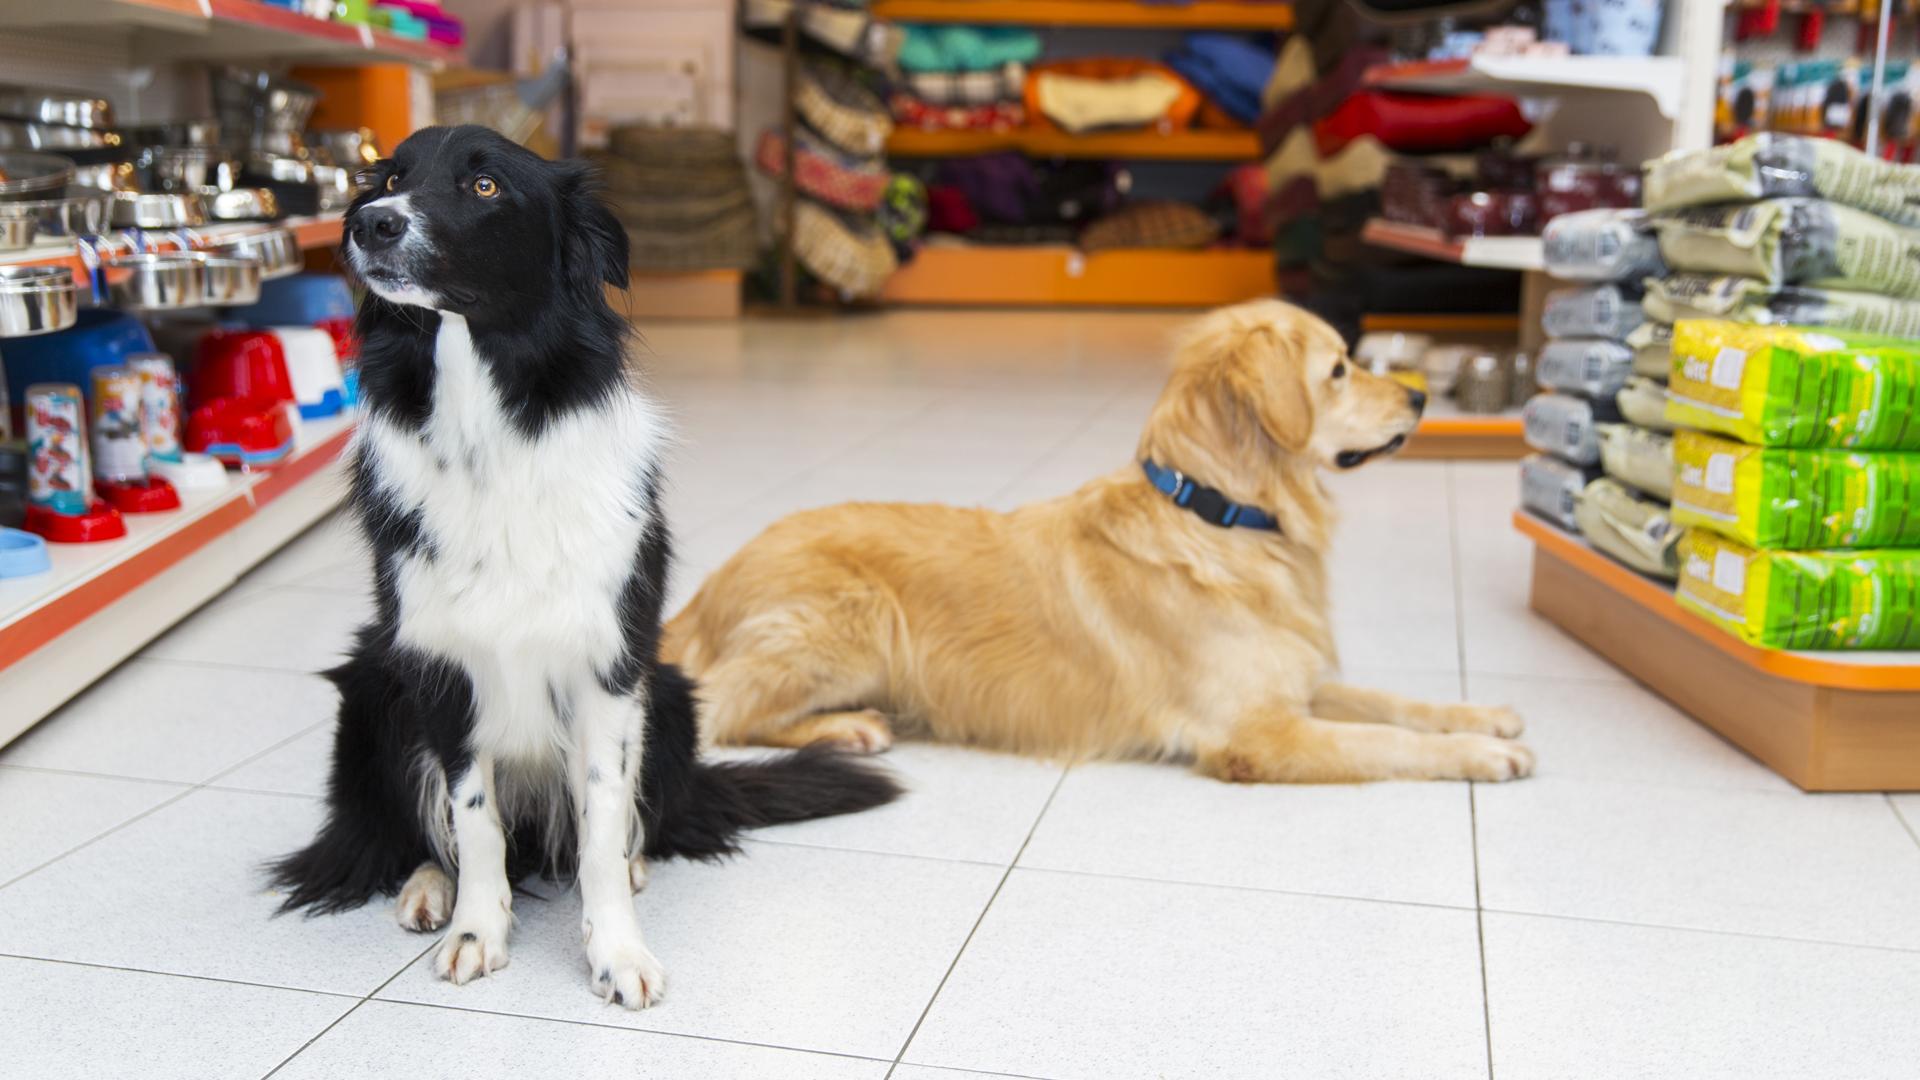 Tienda de animales en Pontevedra